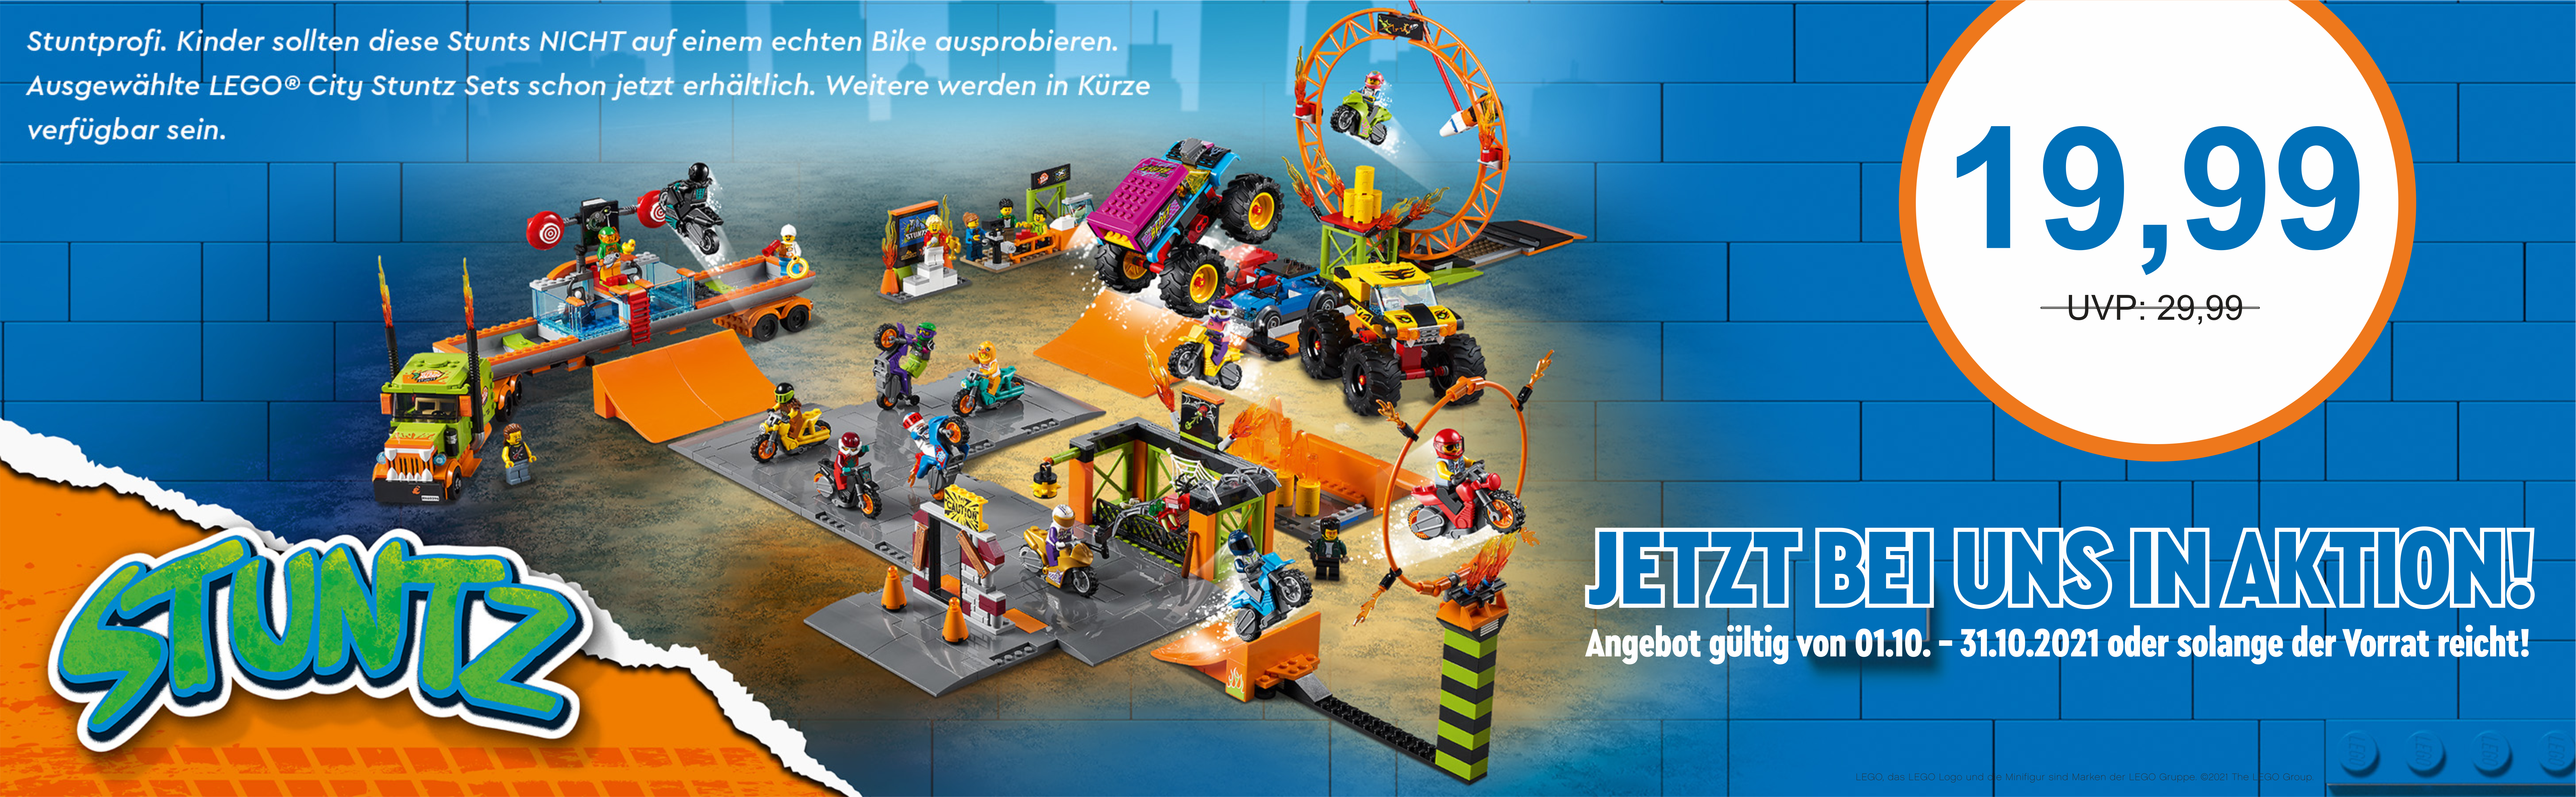 LEGO® City Stuntz